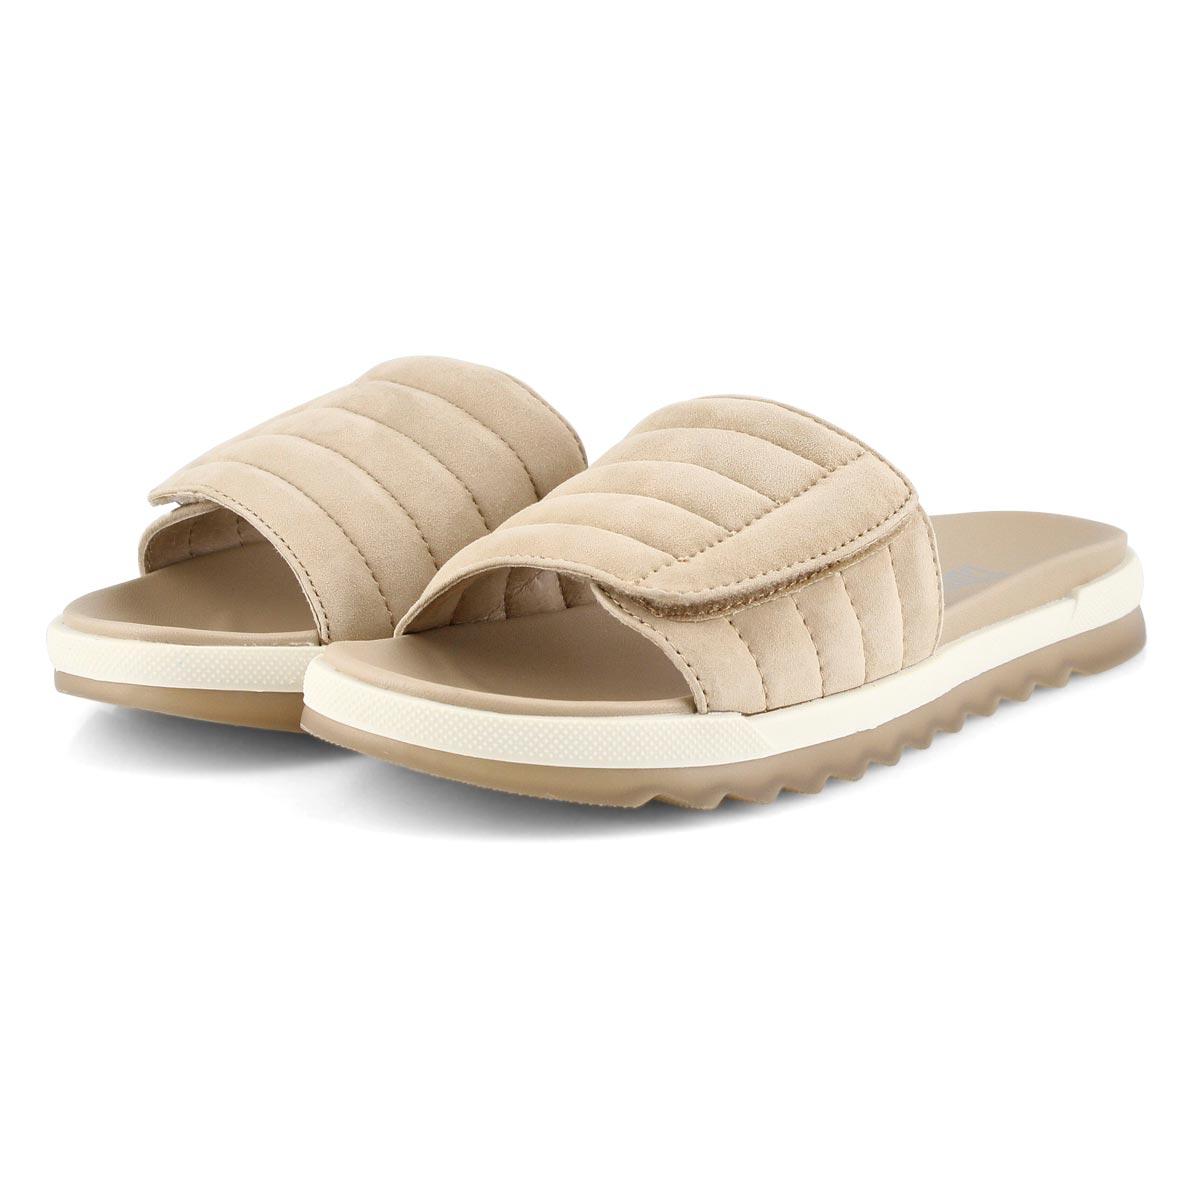 Women's LUPIN sand slide sandals